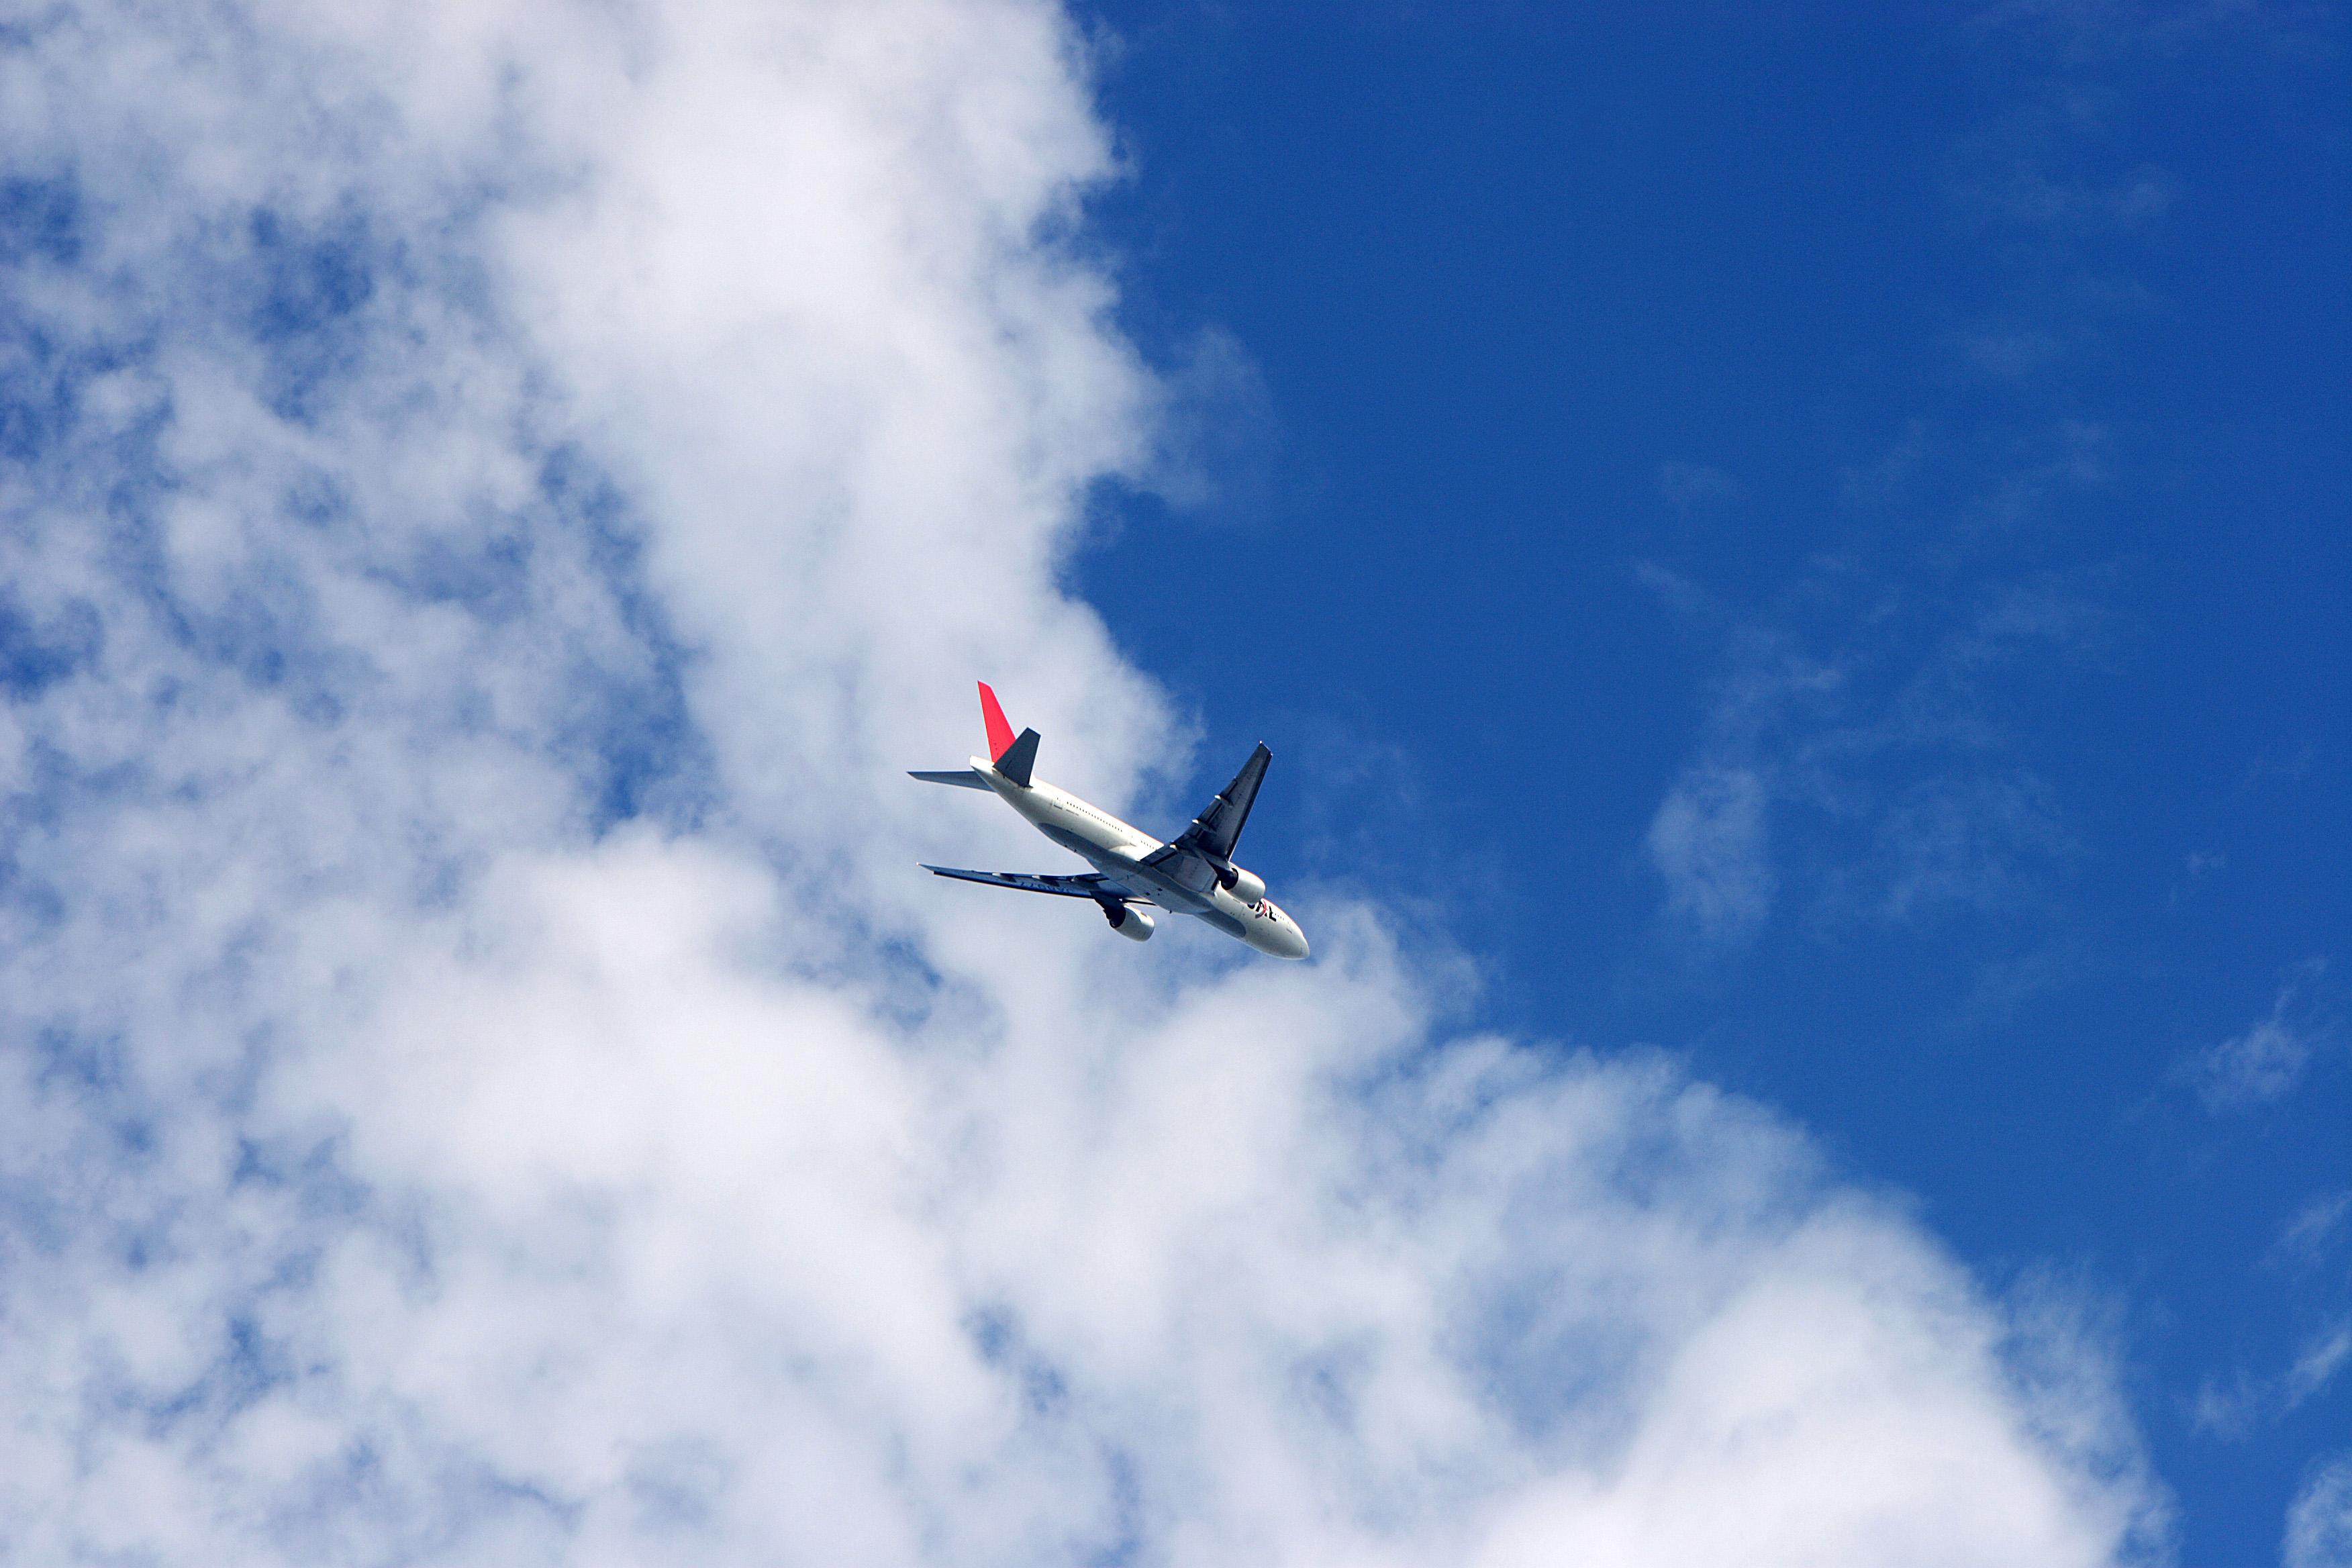 JAL/日本航空、1月の国際線旅客は3.9%増、東南アジアが好調